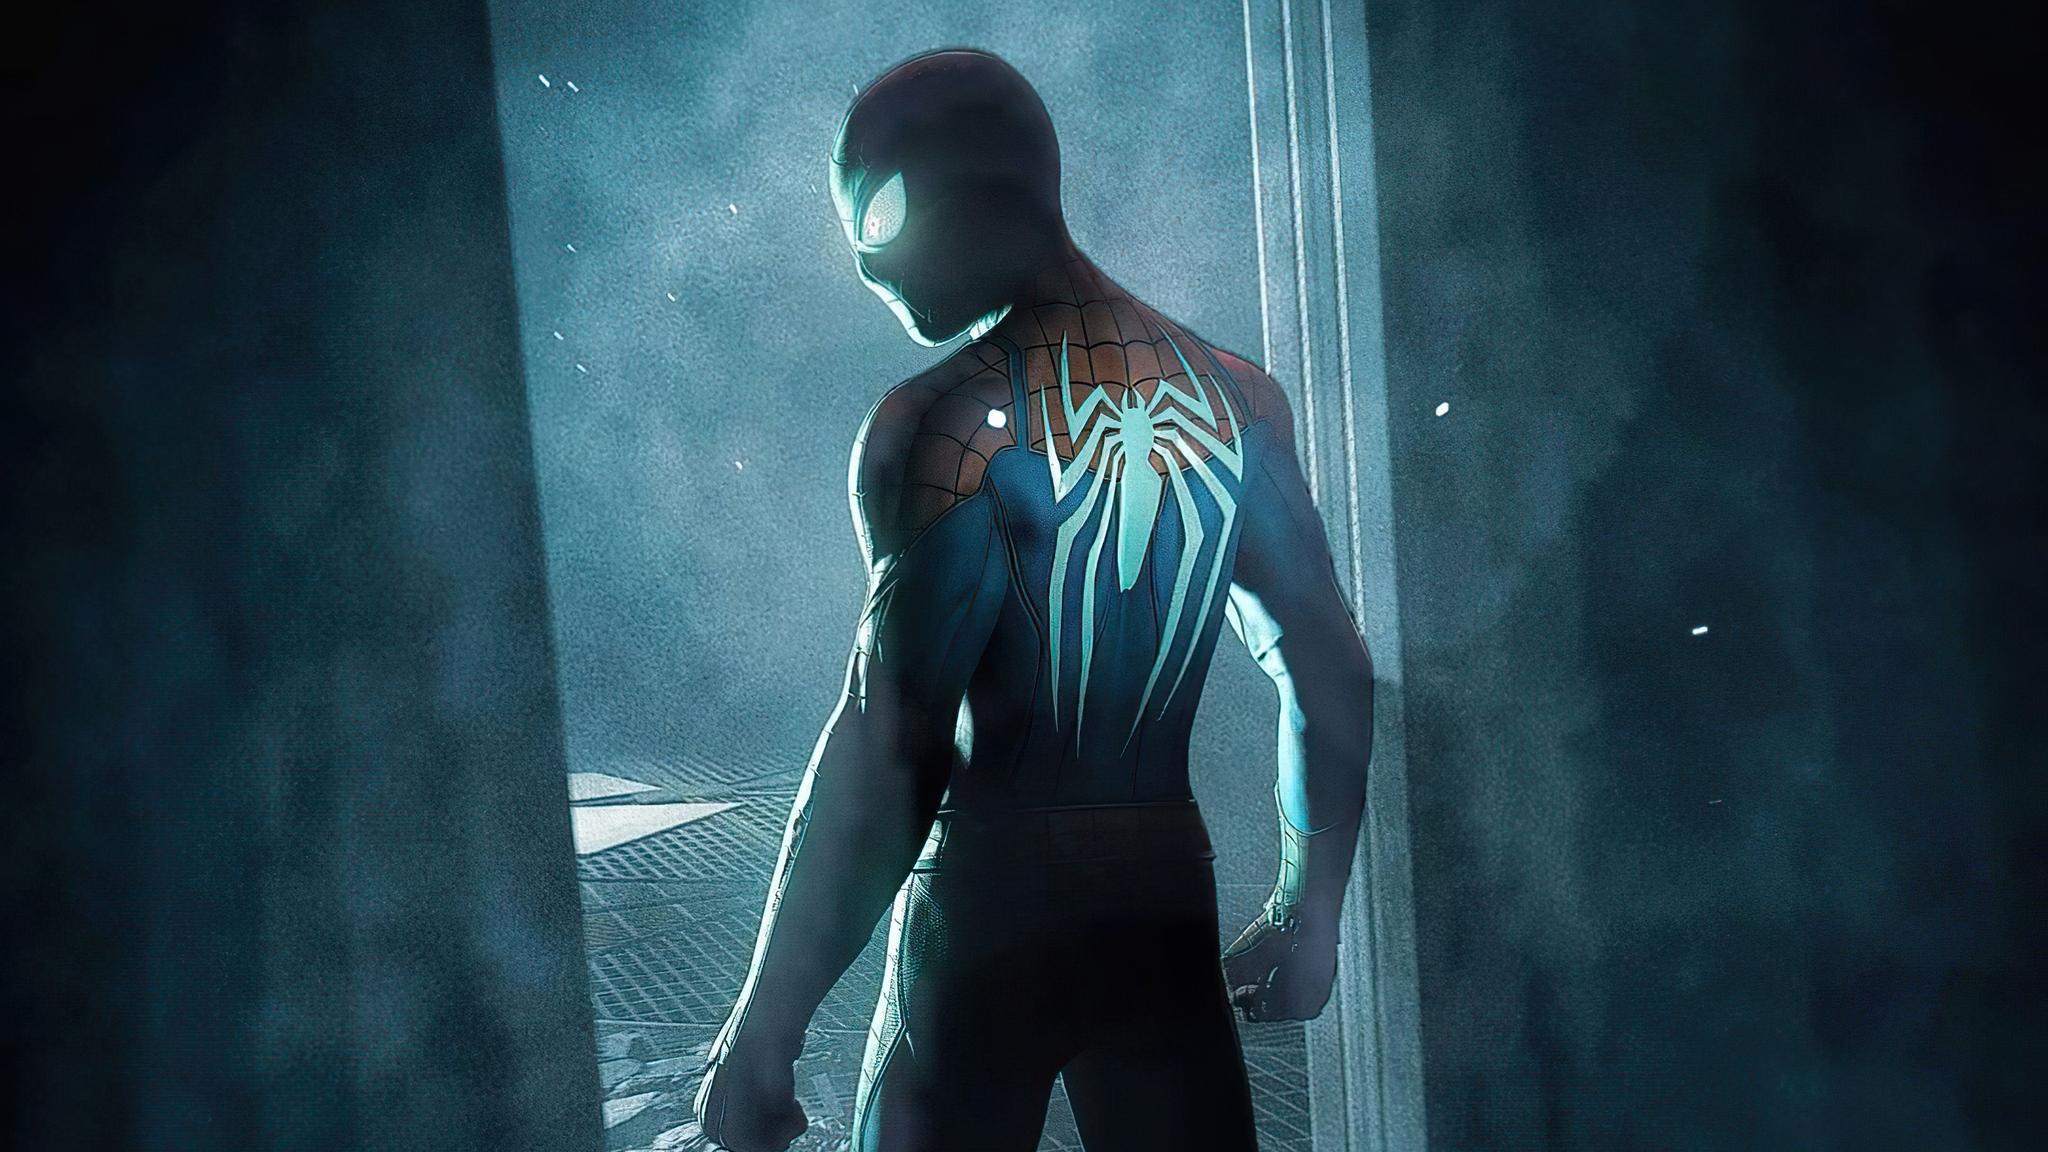 spiderman-remastered-twilight-zone-4k-pn.jpg